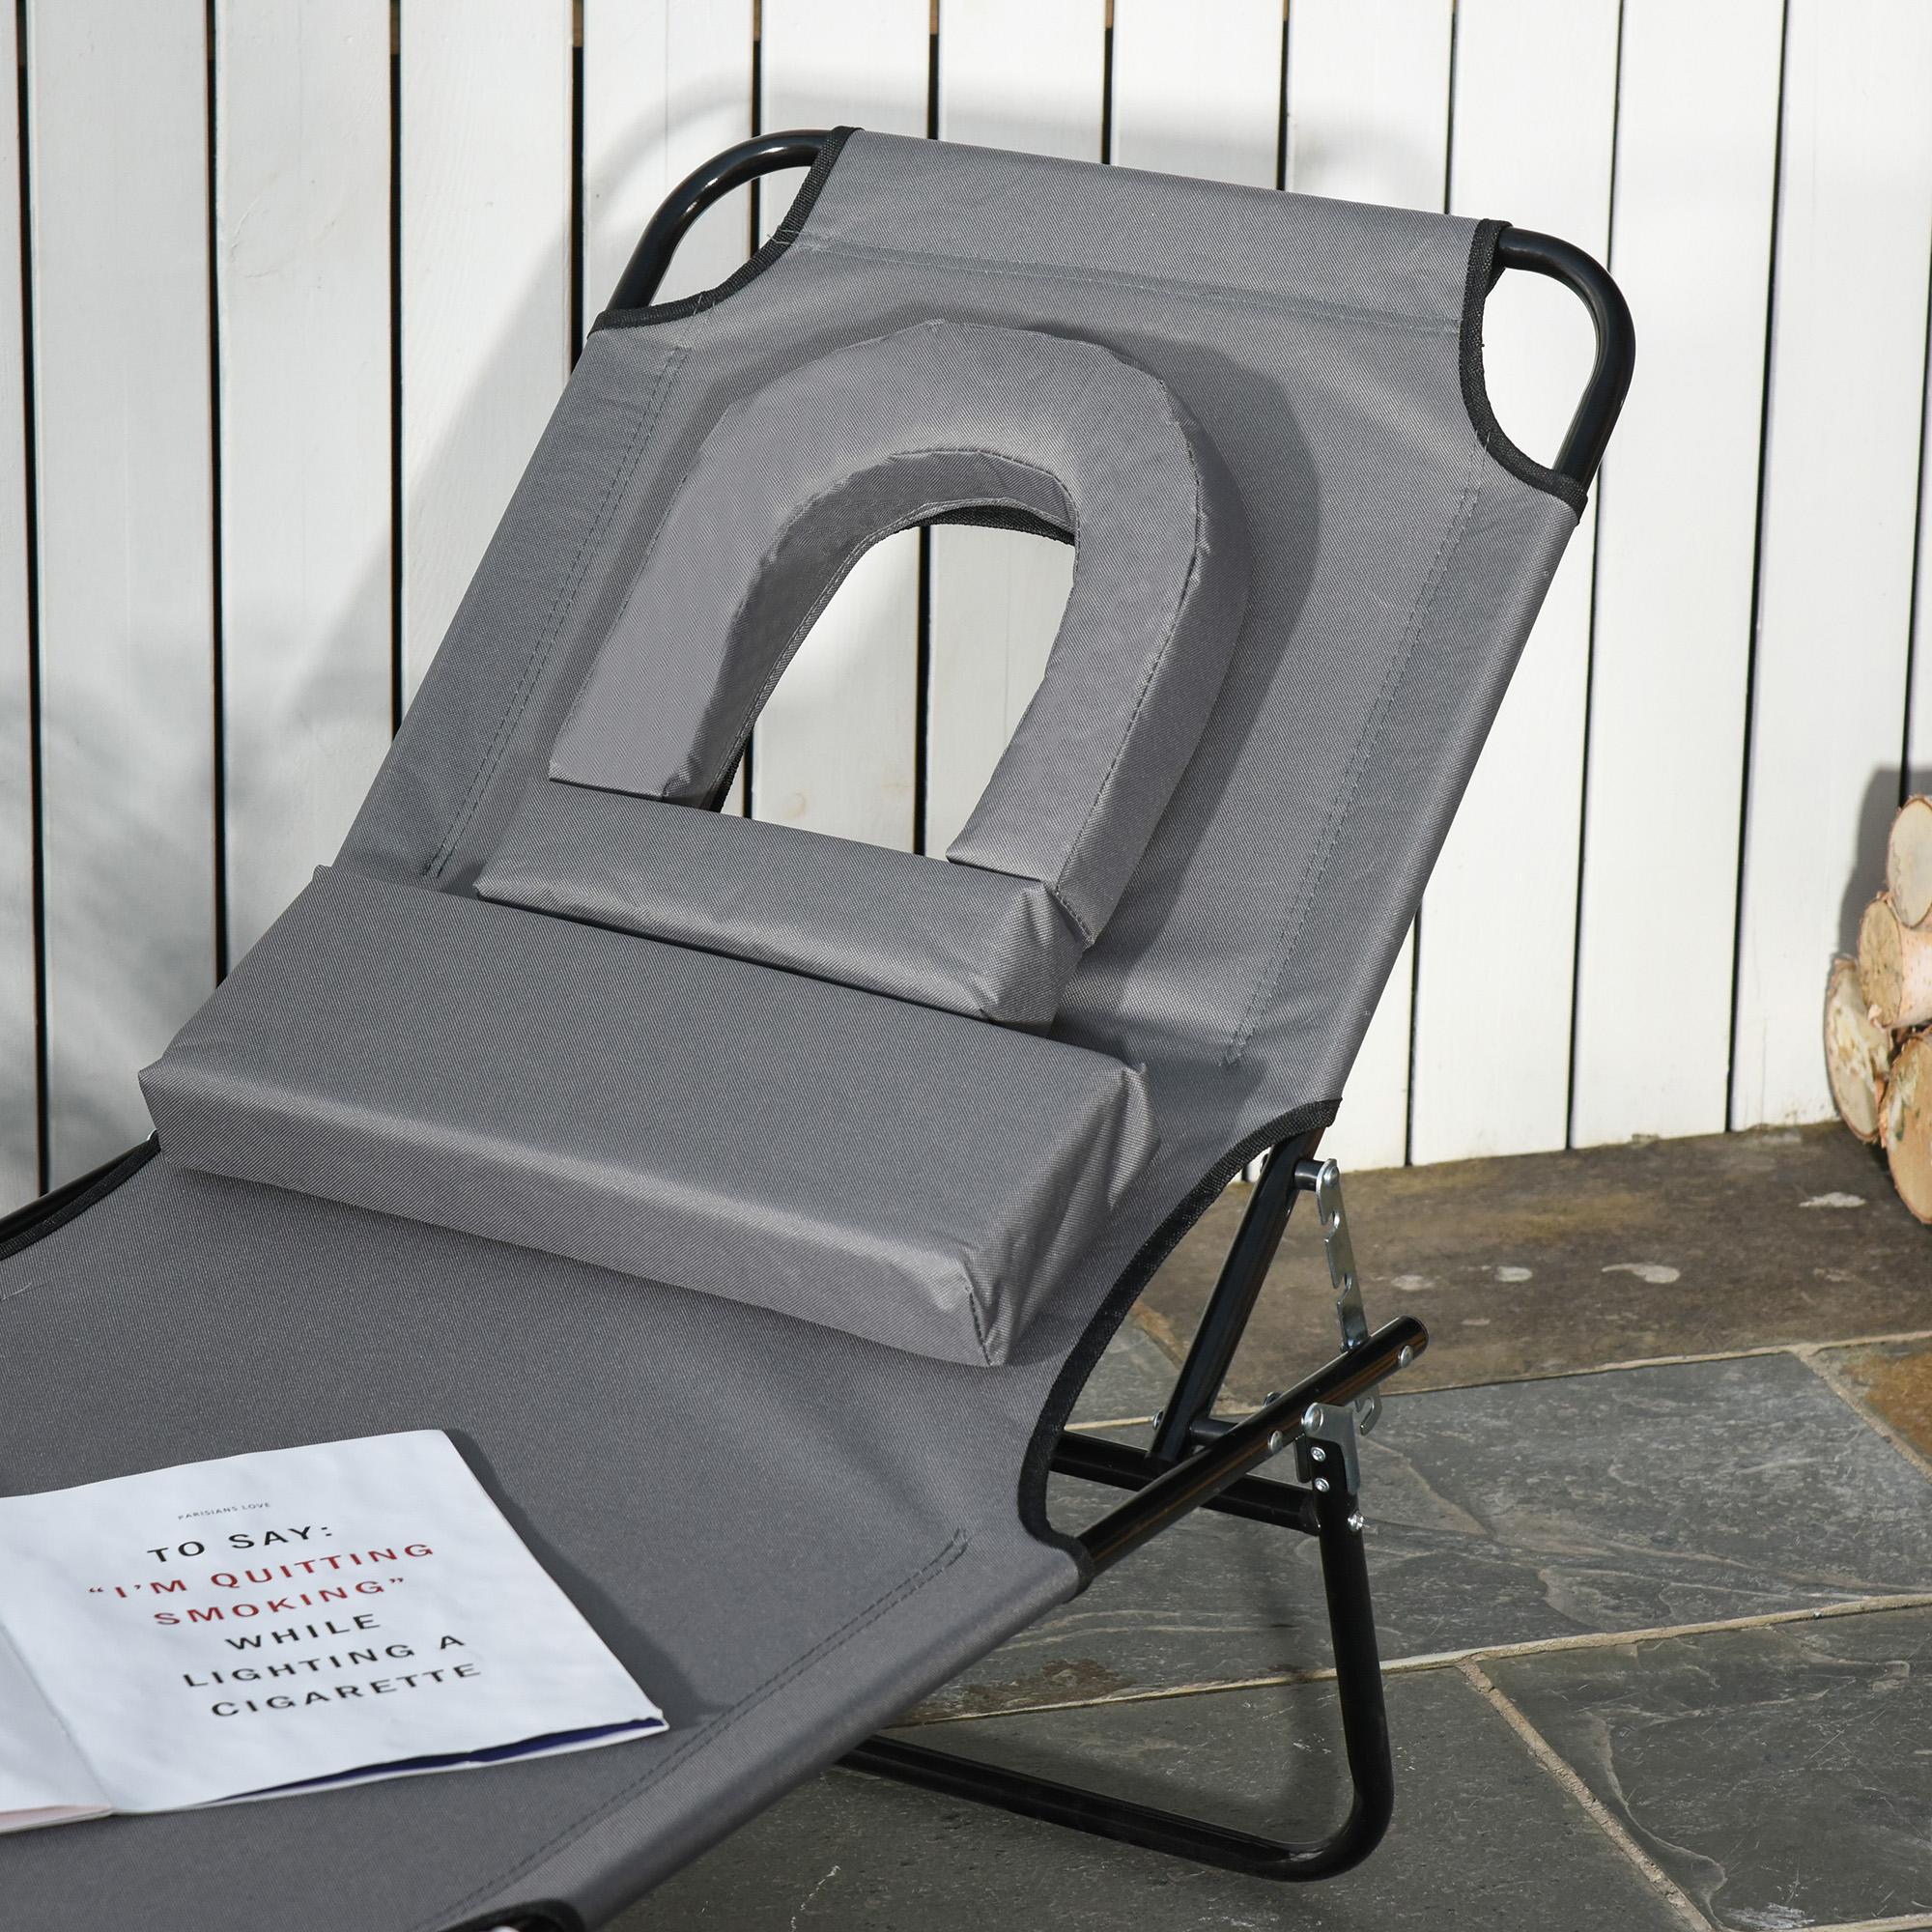 miniatura 39 - Silla Reclinable Plegable Tumbona Reclinable Jardín Al Aire Libre Portátil Asiento Cama